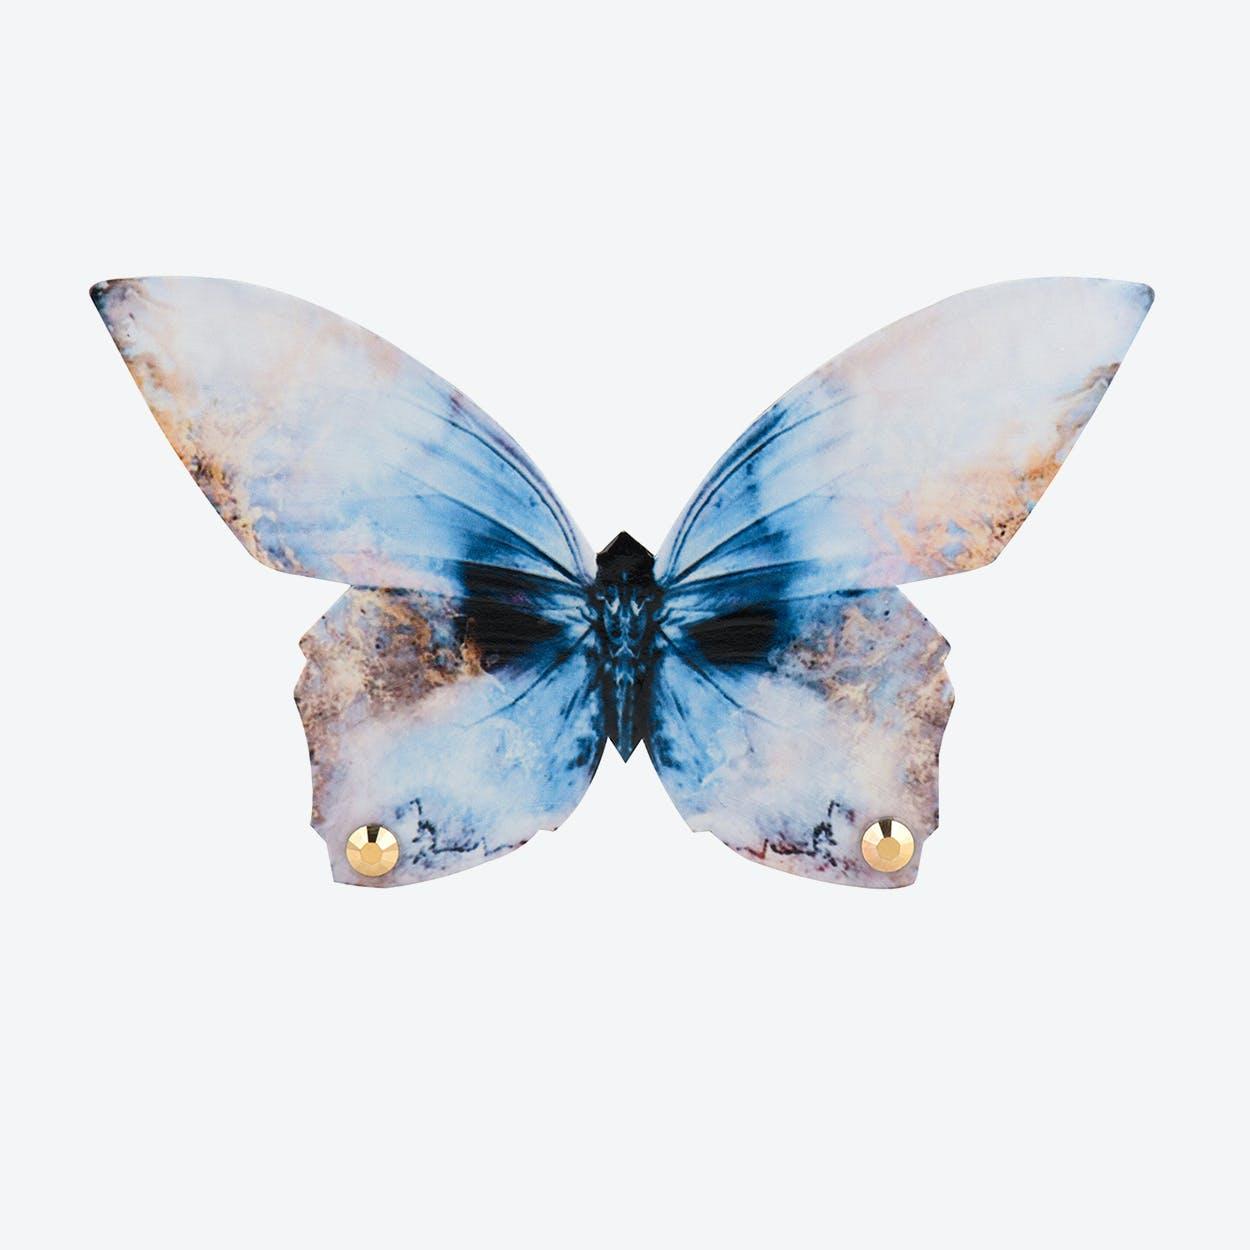 Butterfly Brooch-Tie Spirituality